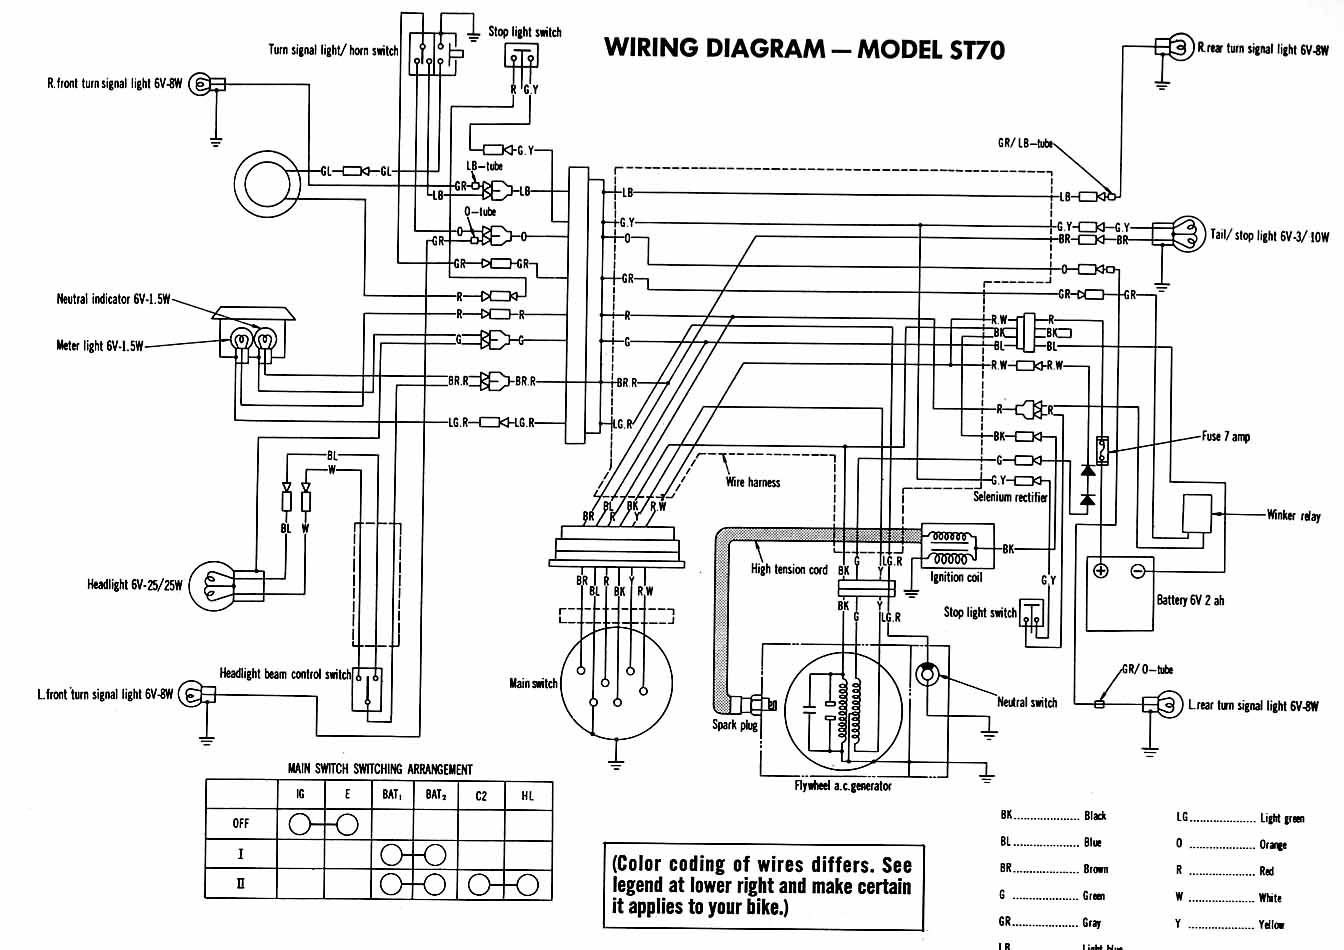 Honda ST70 Electrical Wiring Diagram?resize=665%2C470 jvc kd g340 wiring diagram the best wiring diagram 2017 jvc kd-hdr60 wiring diagram at n-0.co